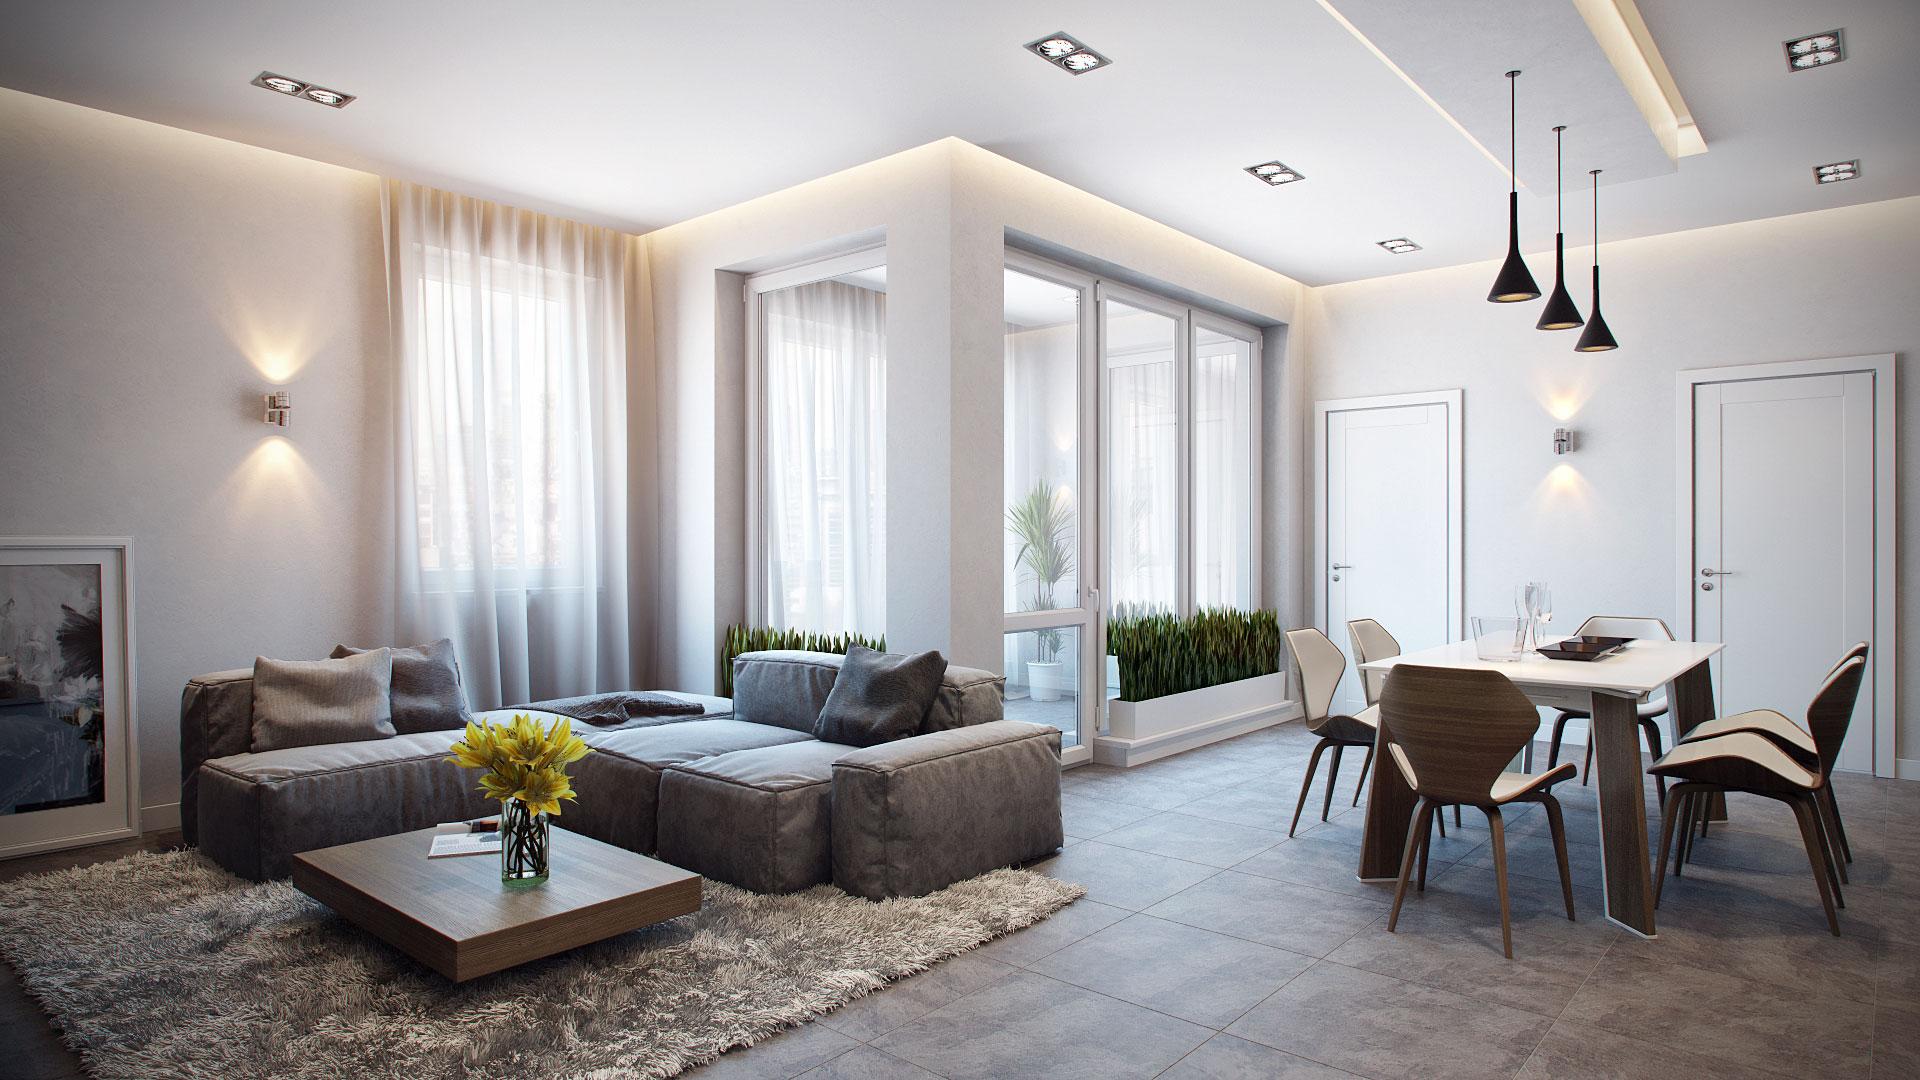 apartment-in-germany-by-alexander-zenzura-01